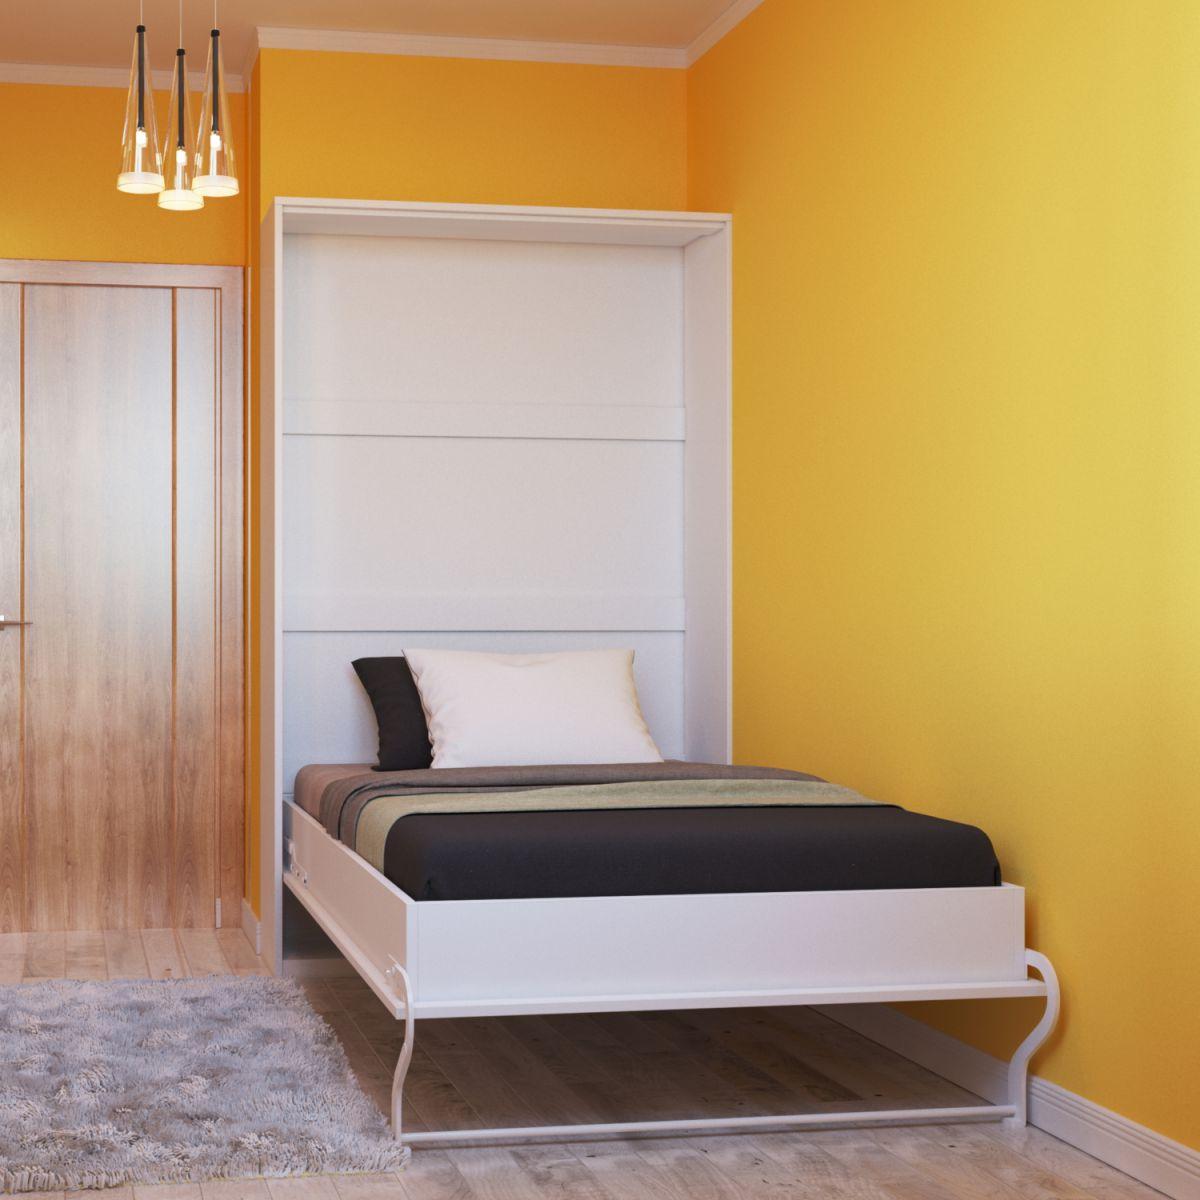 schrankbett 120x200 cm vertikal wei hochglanzfront schrankklappbett wandbett ebay. Black Bedroom Furniture Sets. Home Design Ideas